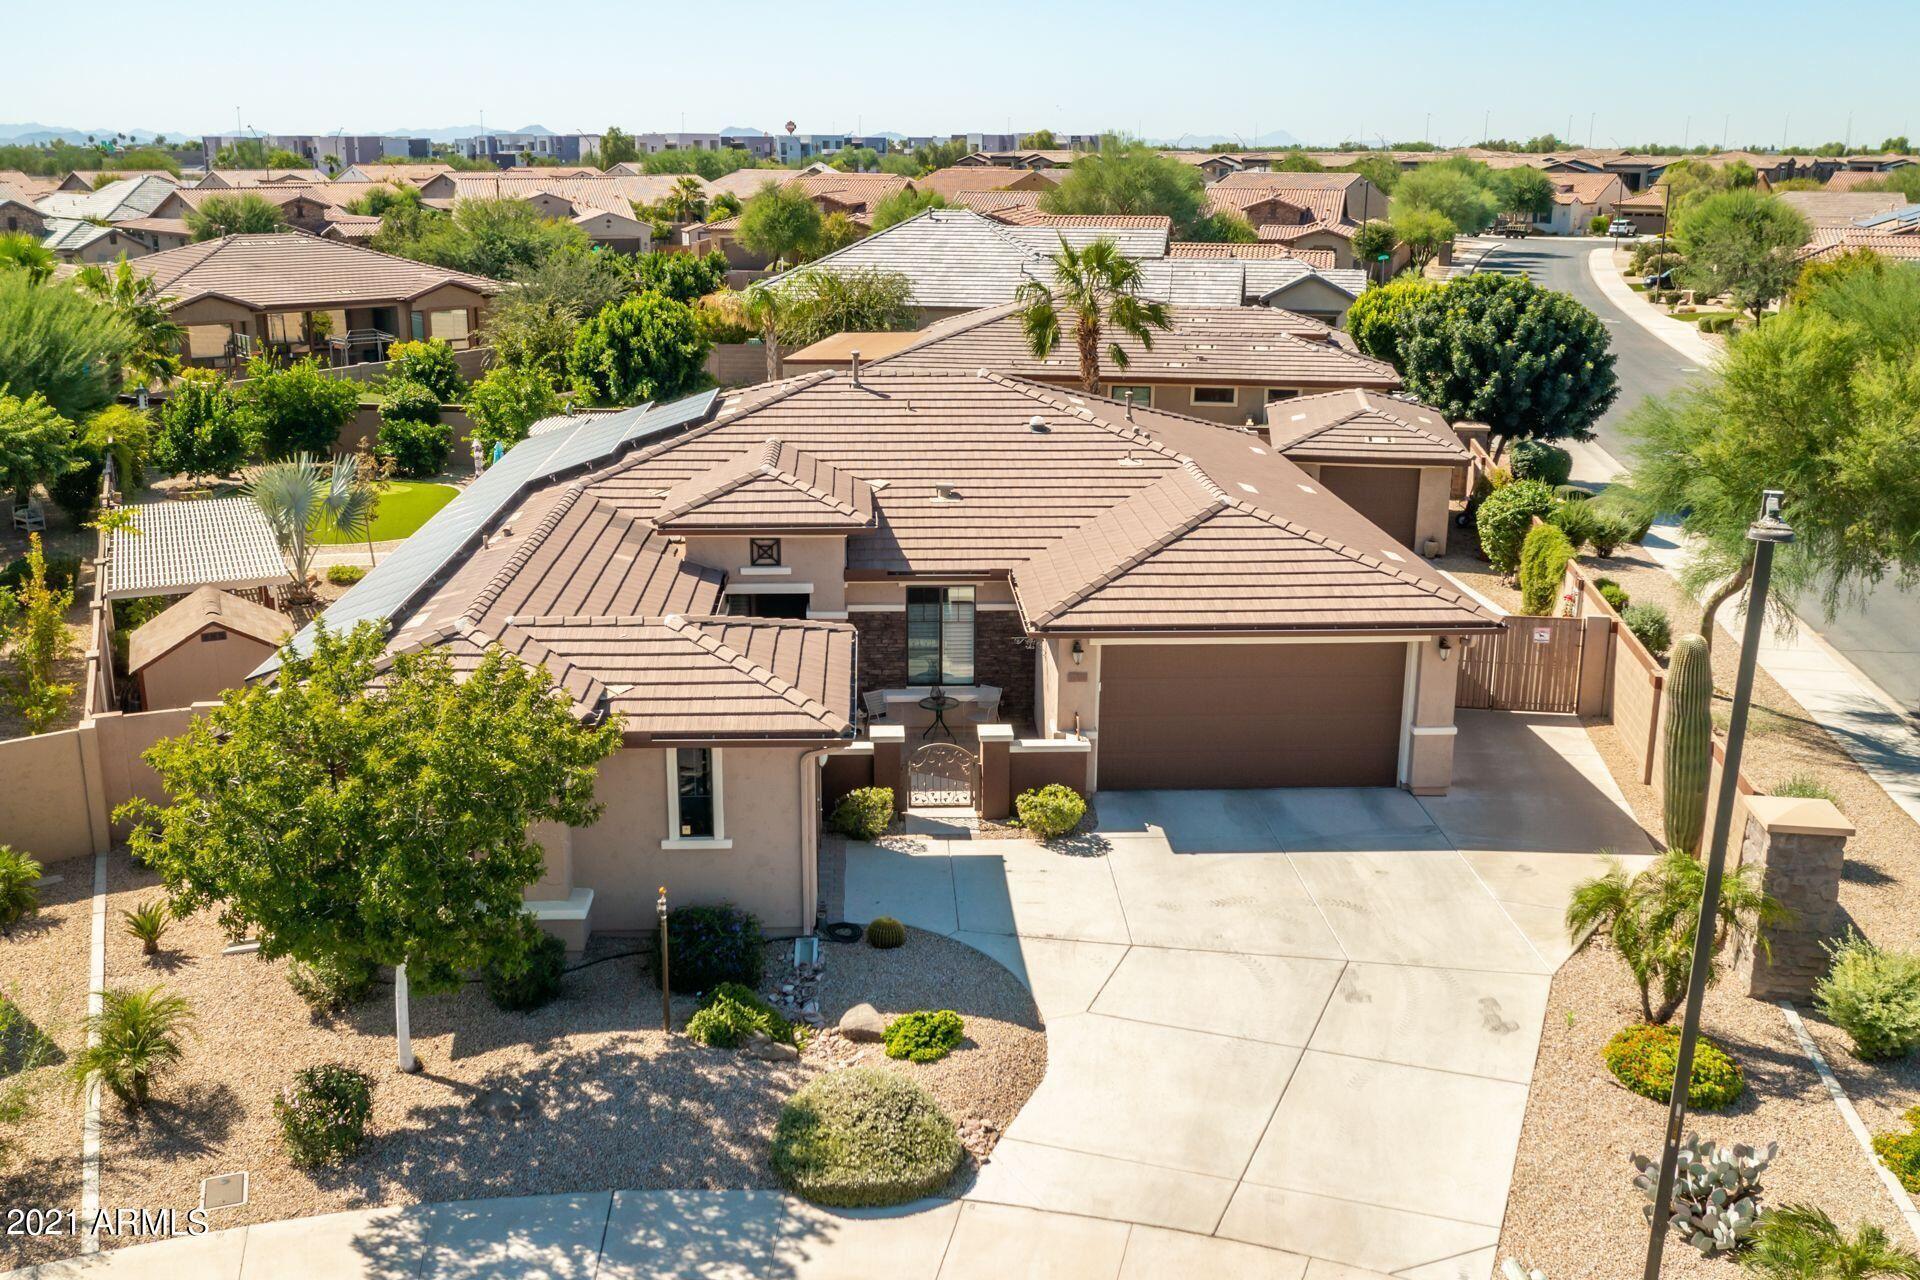 Photo of 15709 W CORONADO Road, Goodyear, AZ 85395 (MLS # 6301667)